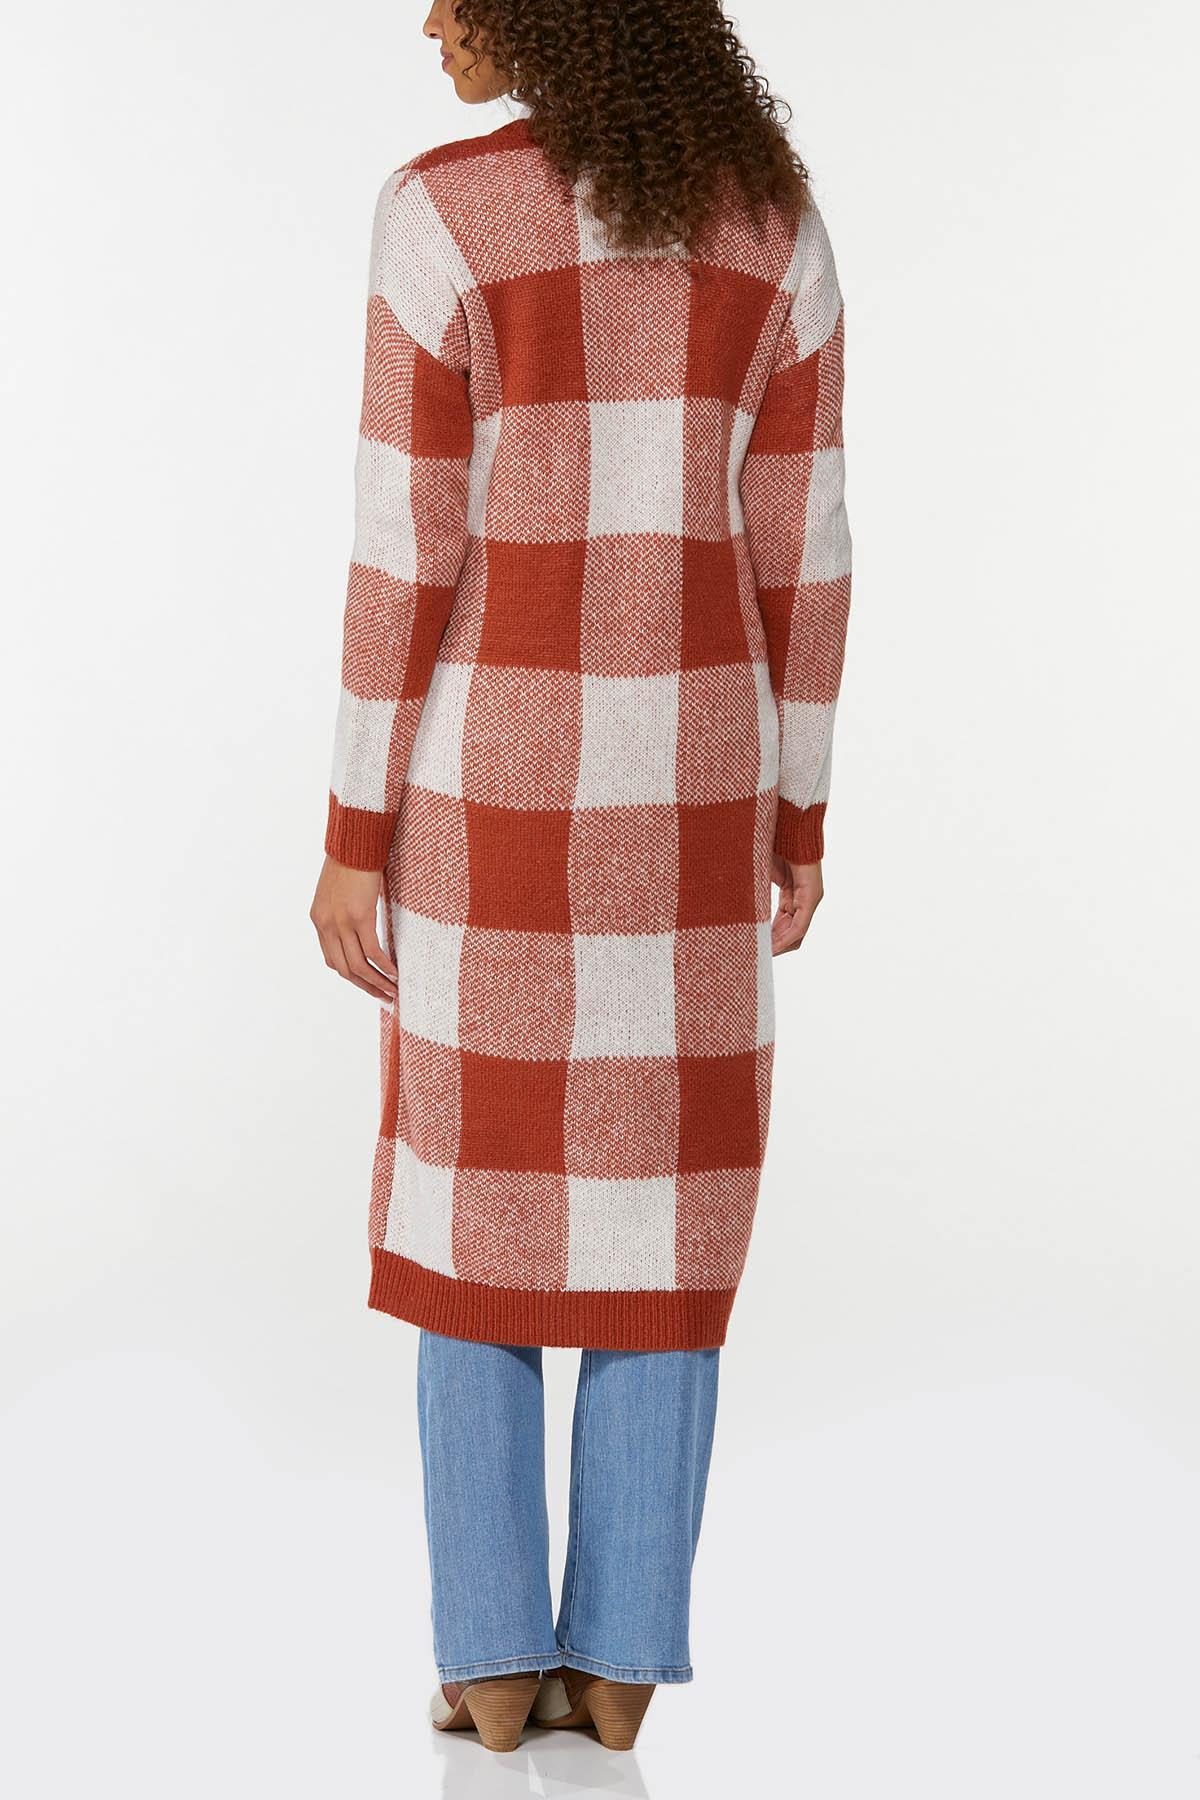 Amber Plaid Cardigan Sweater (Item #44656361)